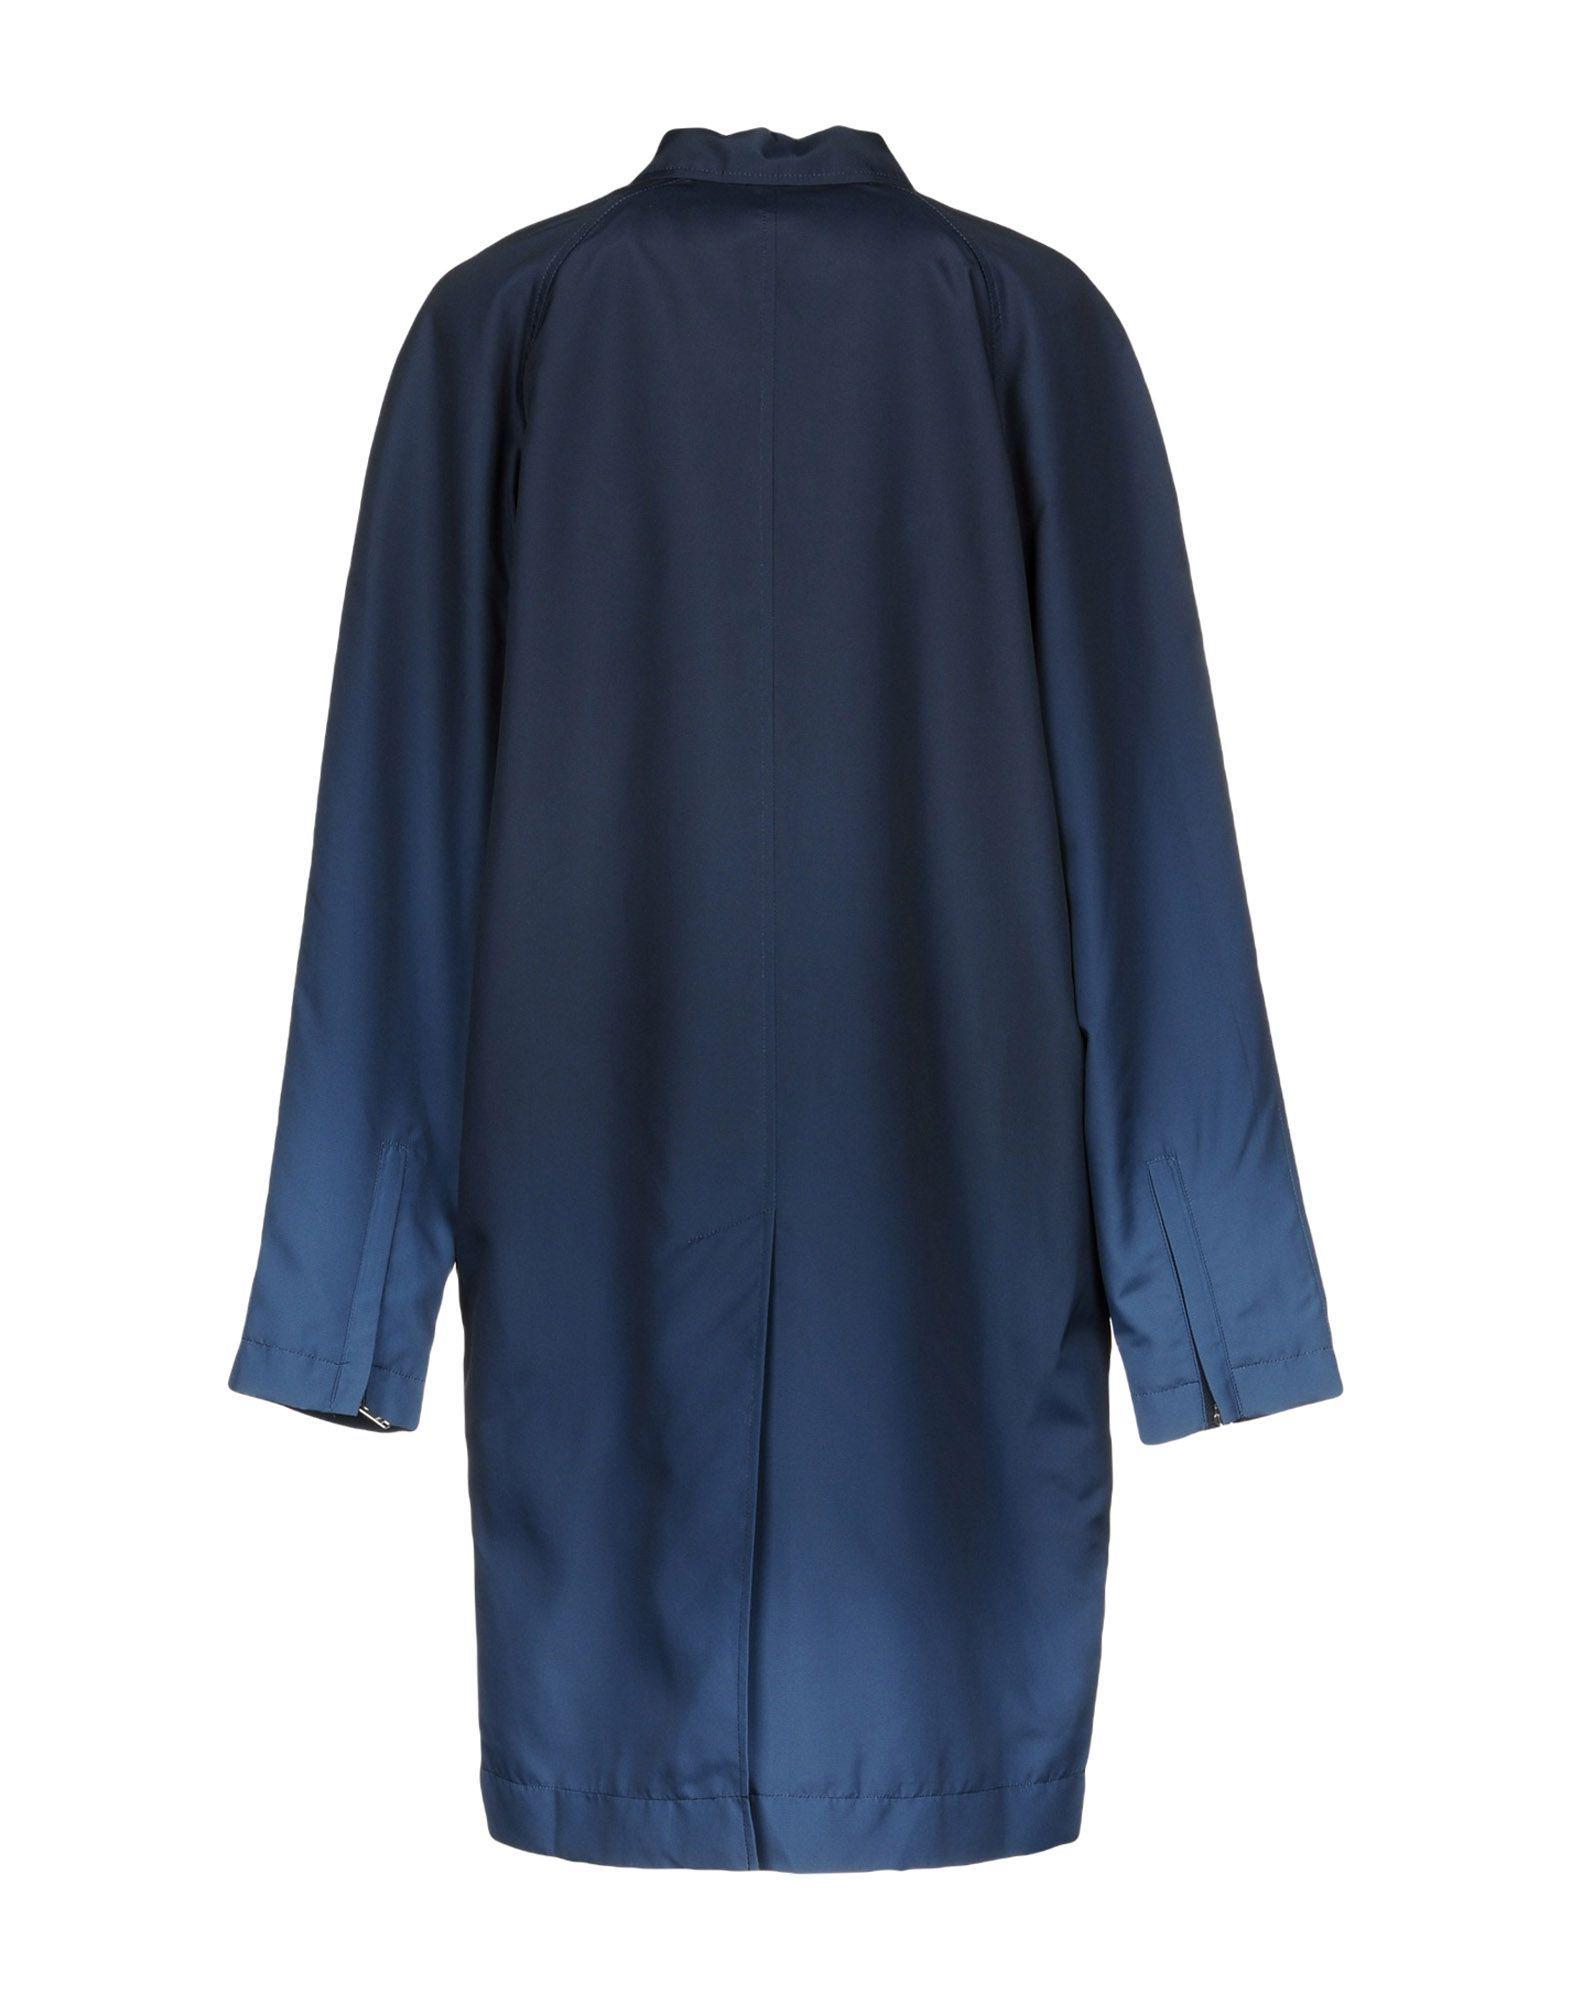 Wood Wood Dark Blue Techno Fabric Overcoat